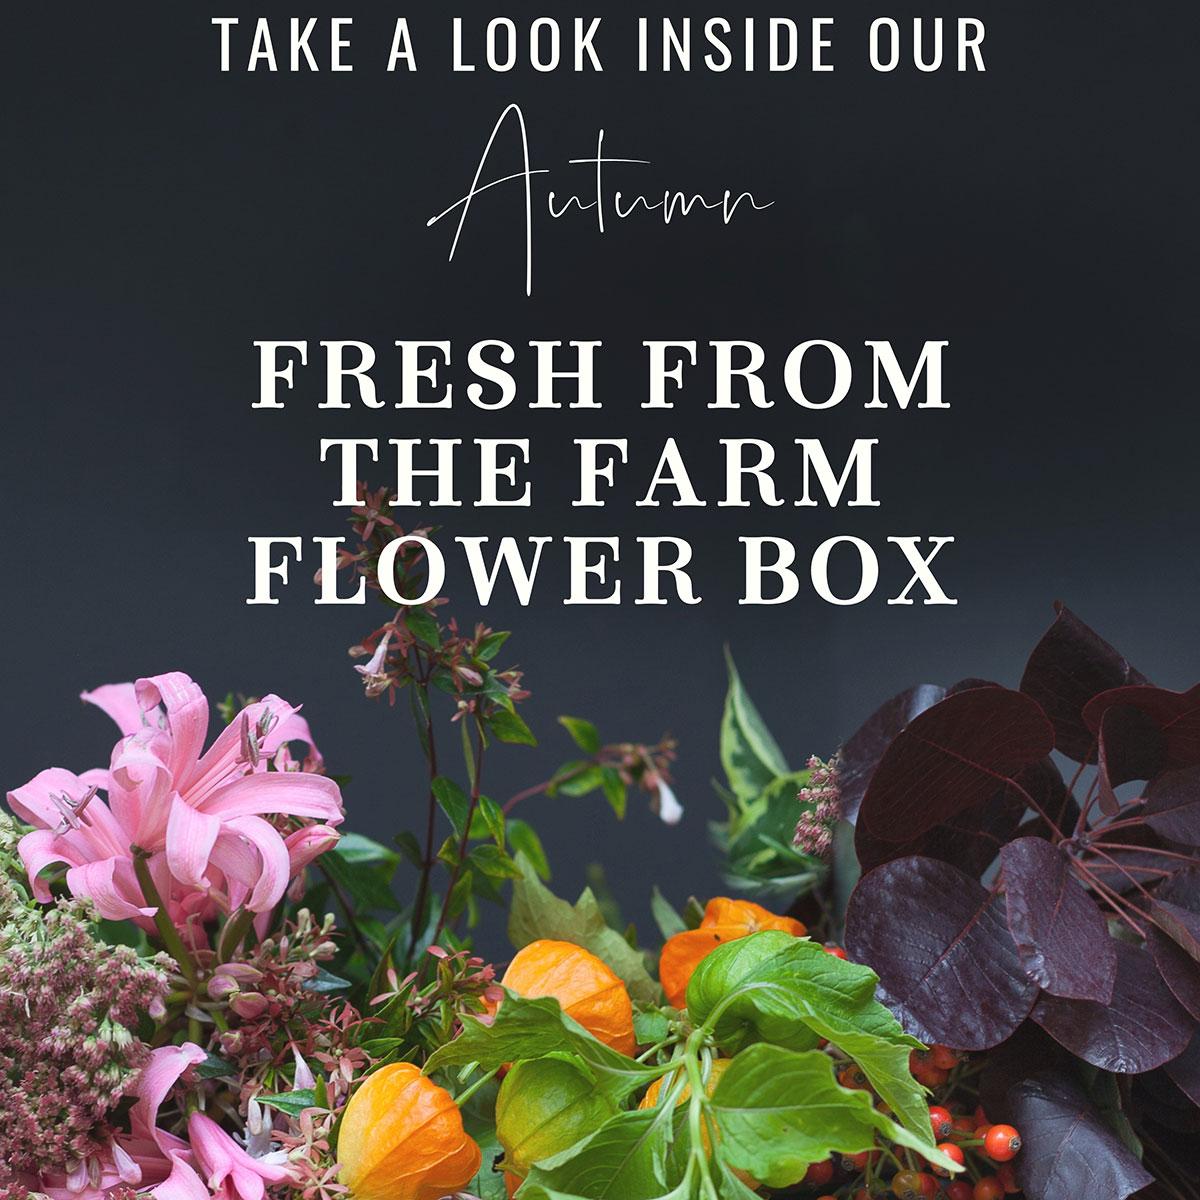 Take a Look Inside Our Autumn Farm Flower Box